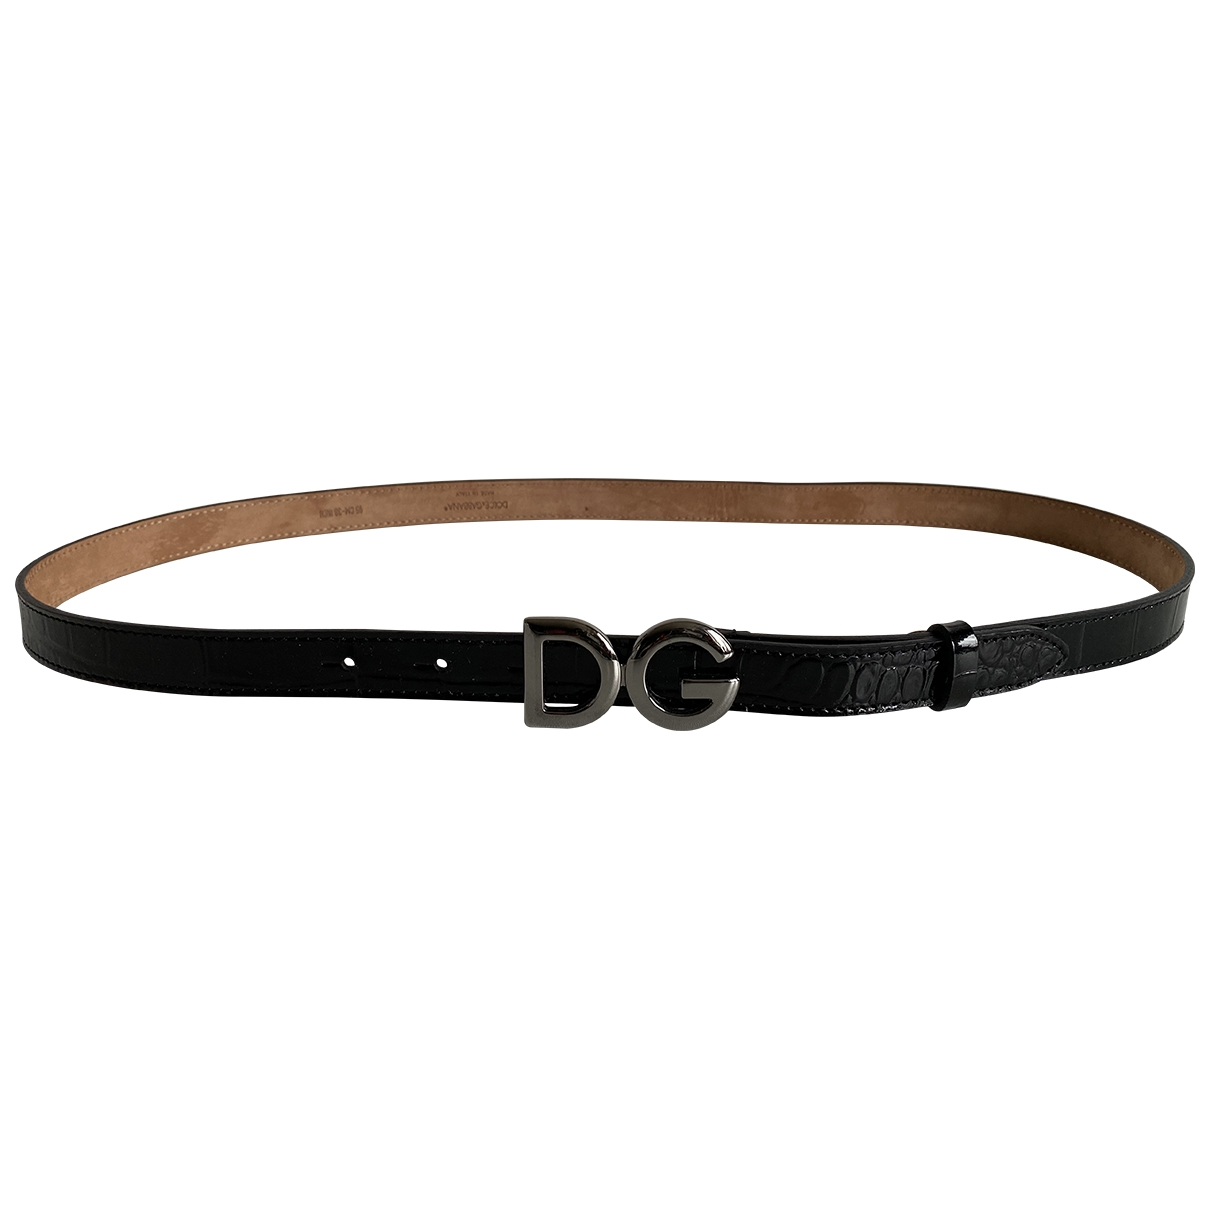 Dolce & Gabbana \N Black Patent leather belt for Women 95 cm